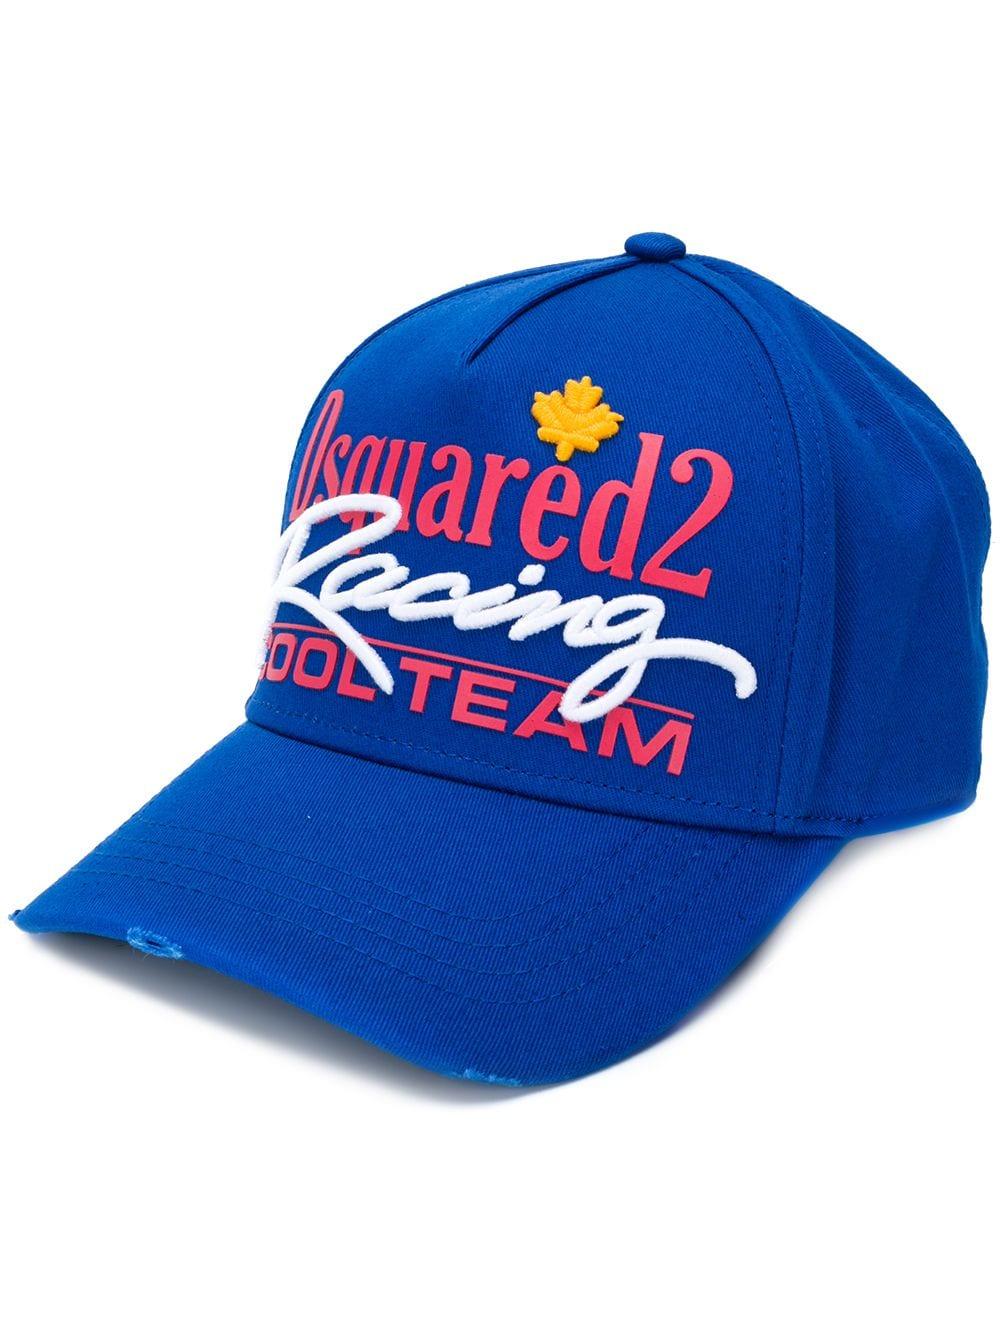 eb4bbb52e601b Racing Baseball Cap - DSQUARED2 - Russocapri